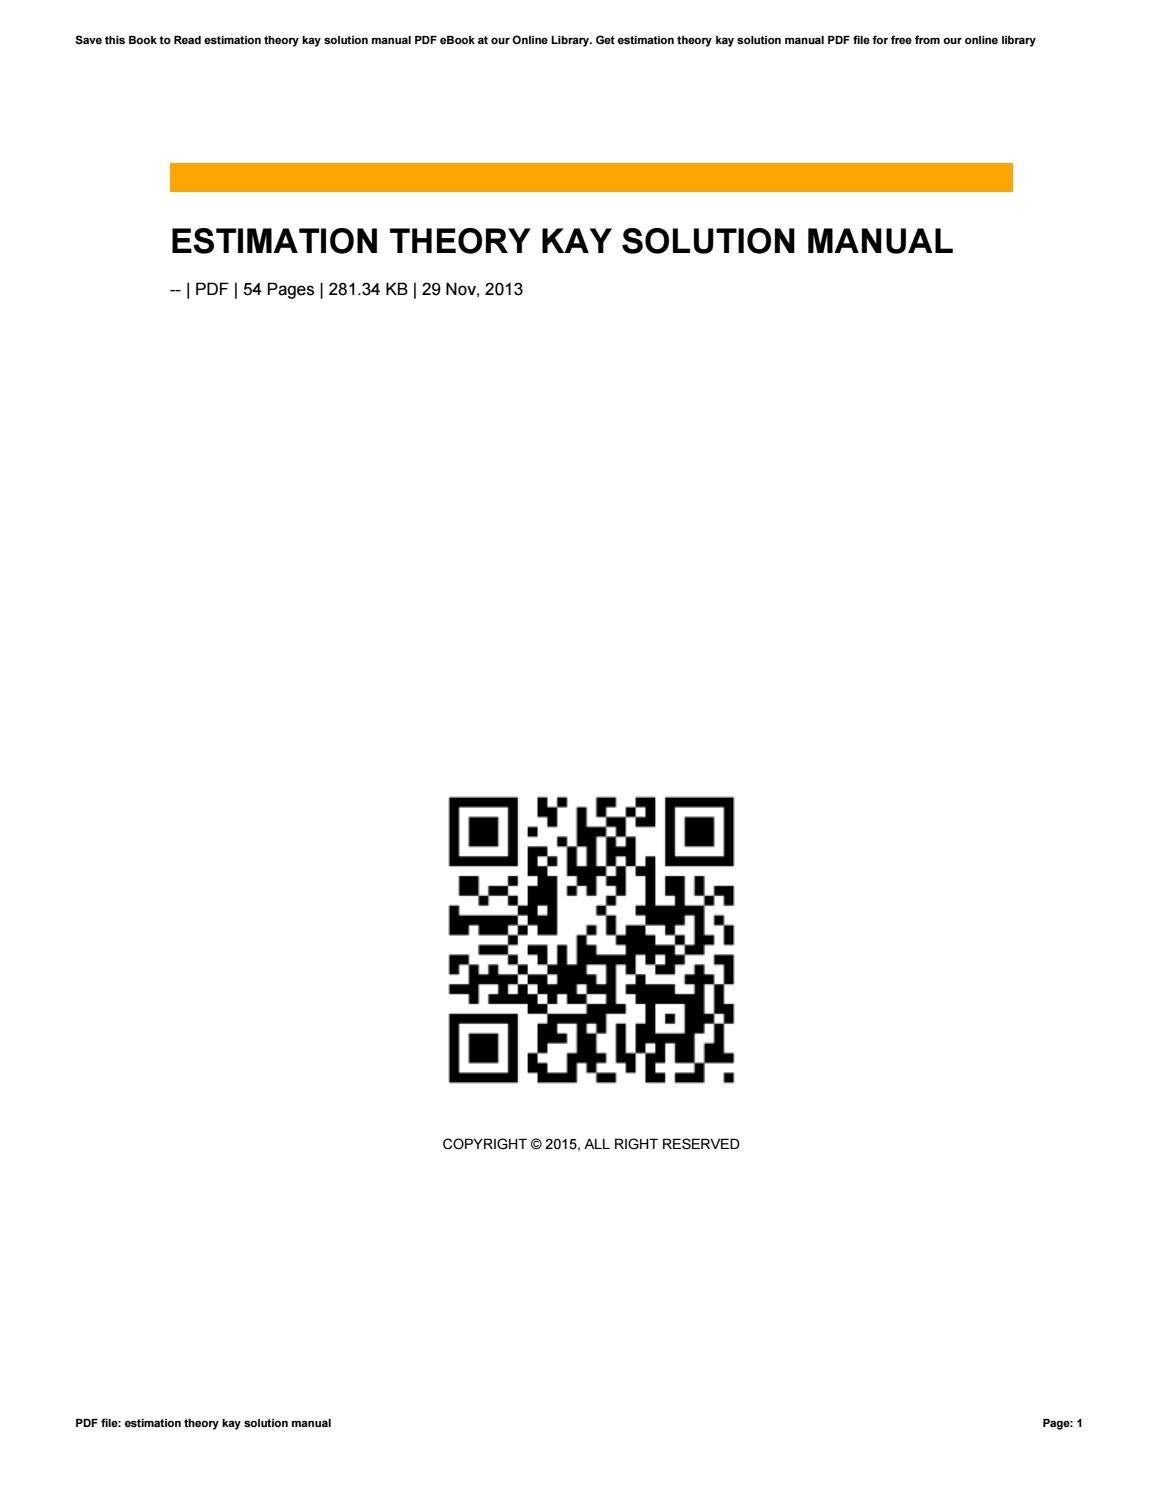 estimation theory kay solution manual by hujia87msisa issuu rh issuu com estimation theory kay solution manual pdf Decision Theory